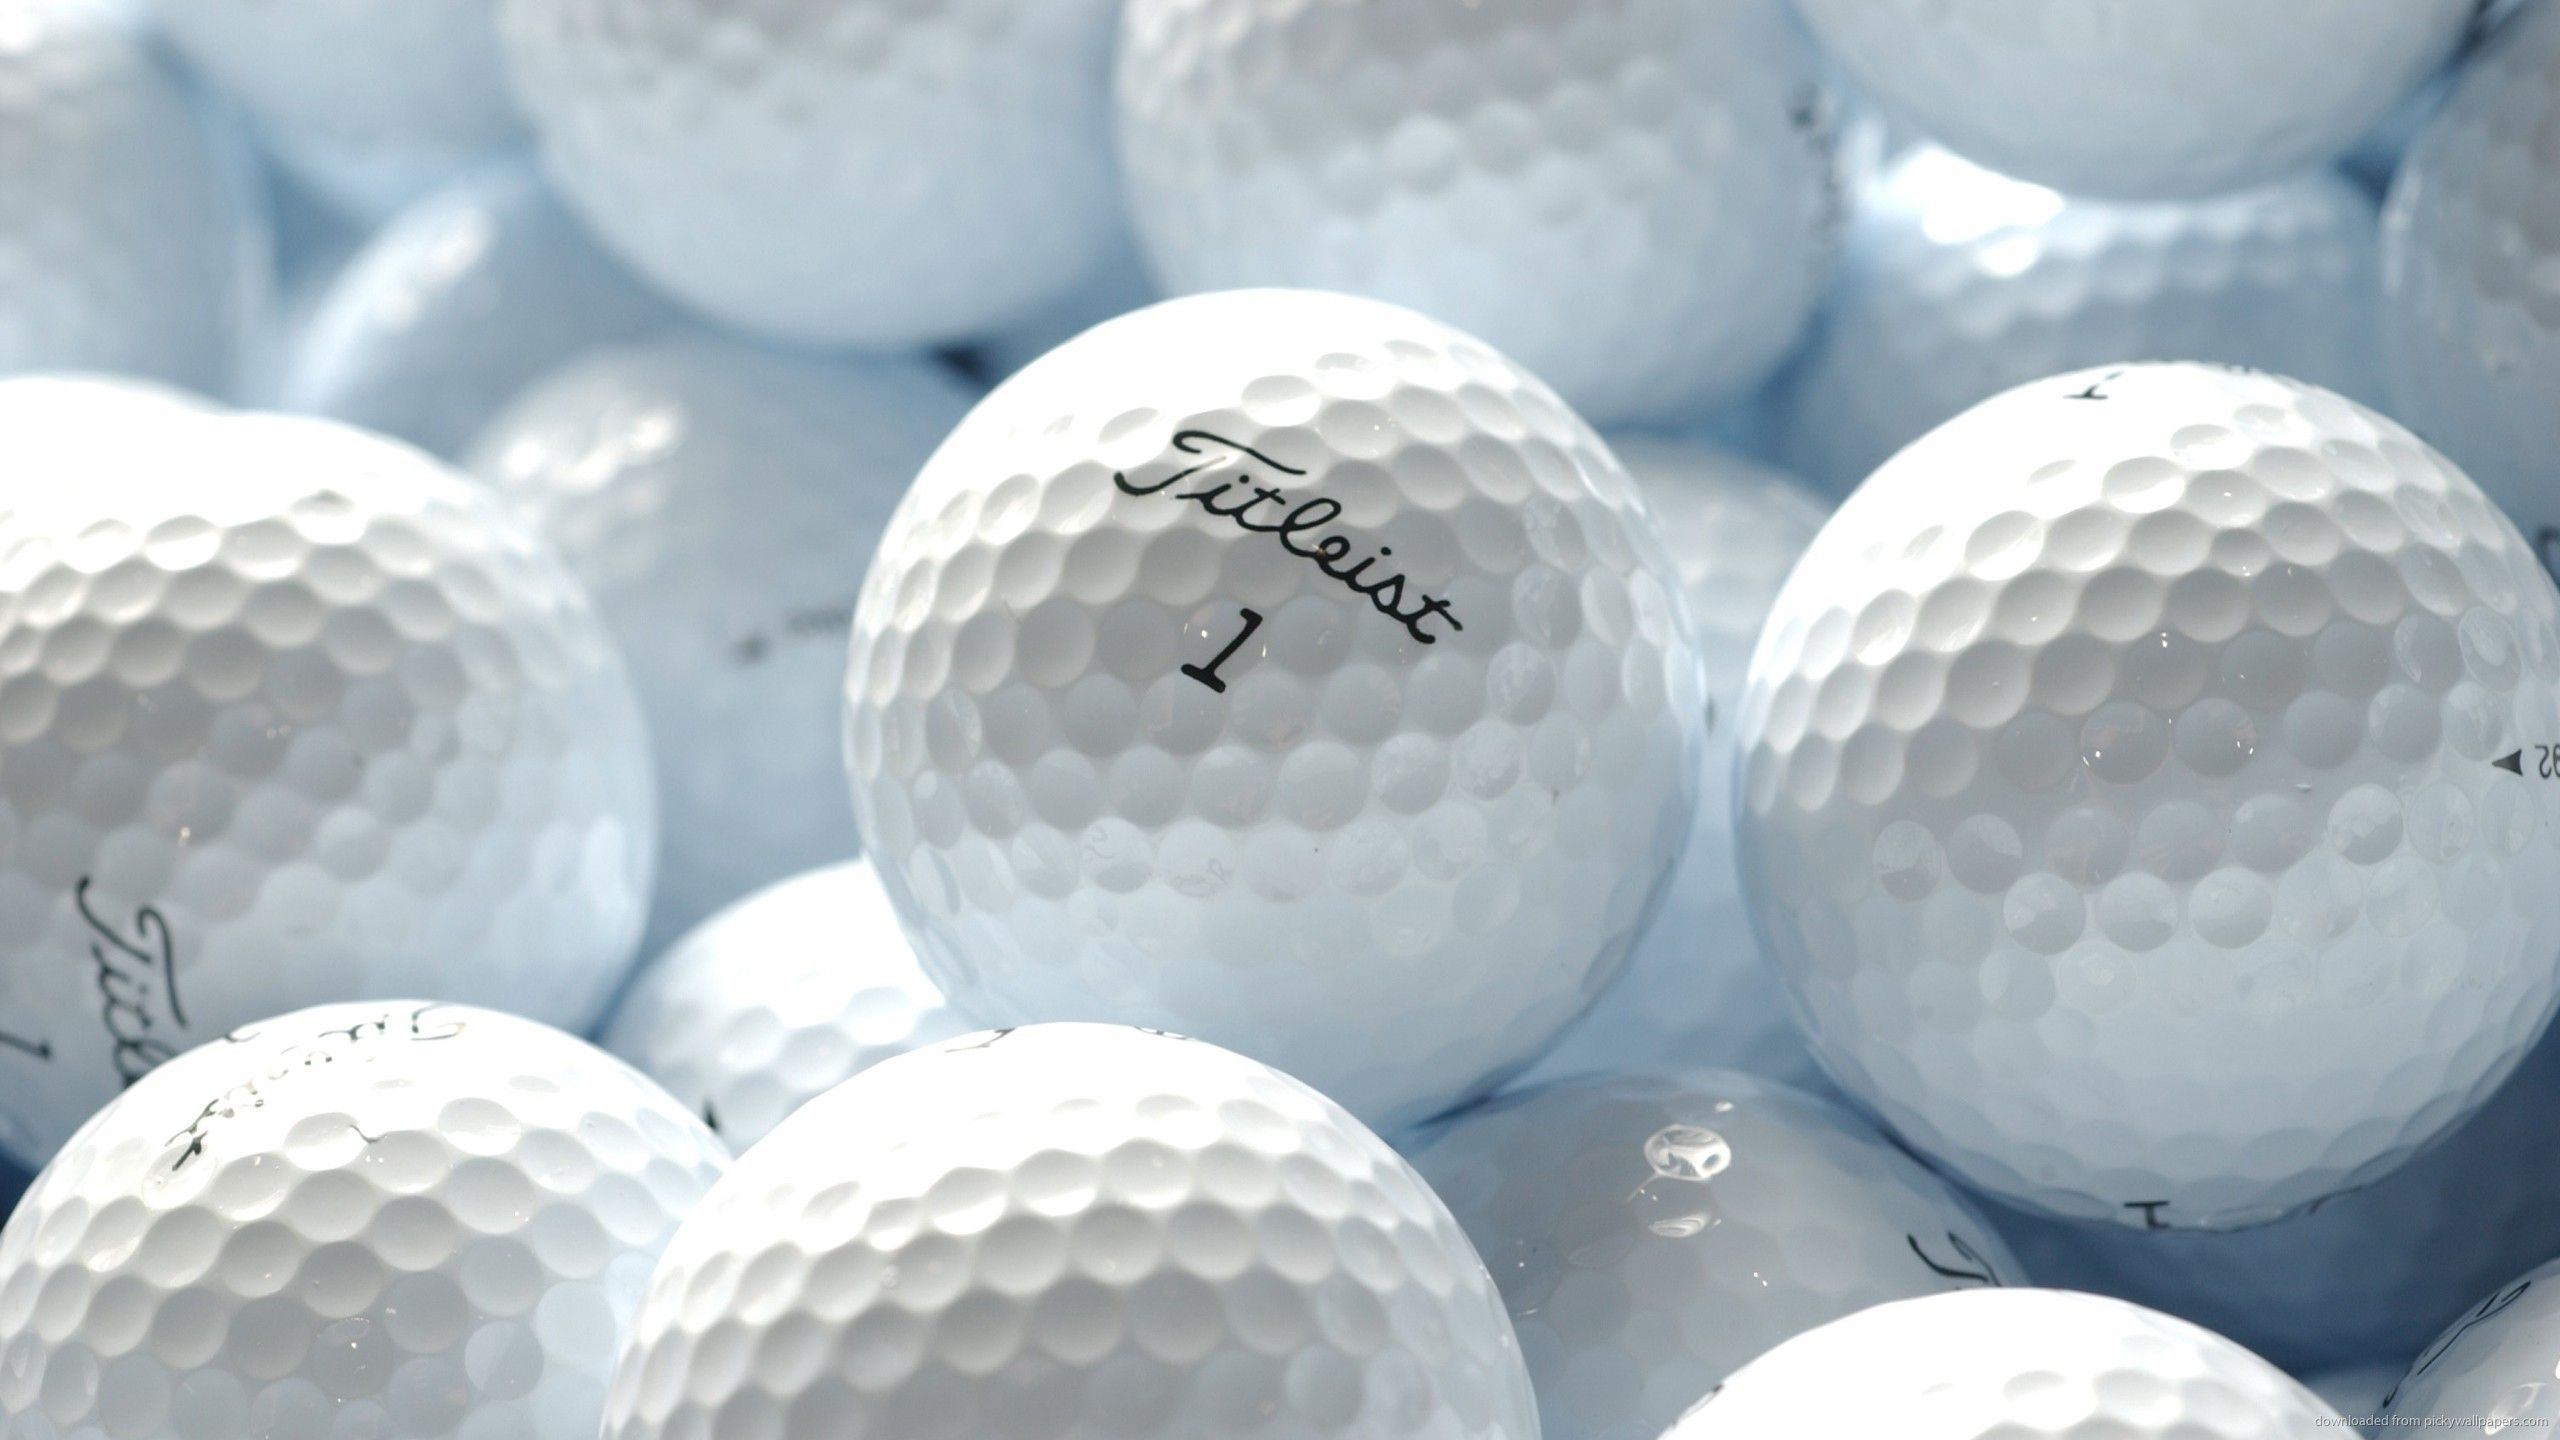 Golfing Desktop Wallpapers Top Free Golfing Desktop